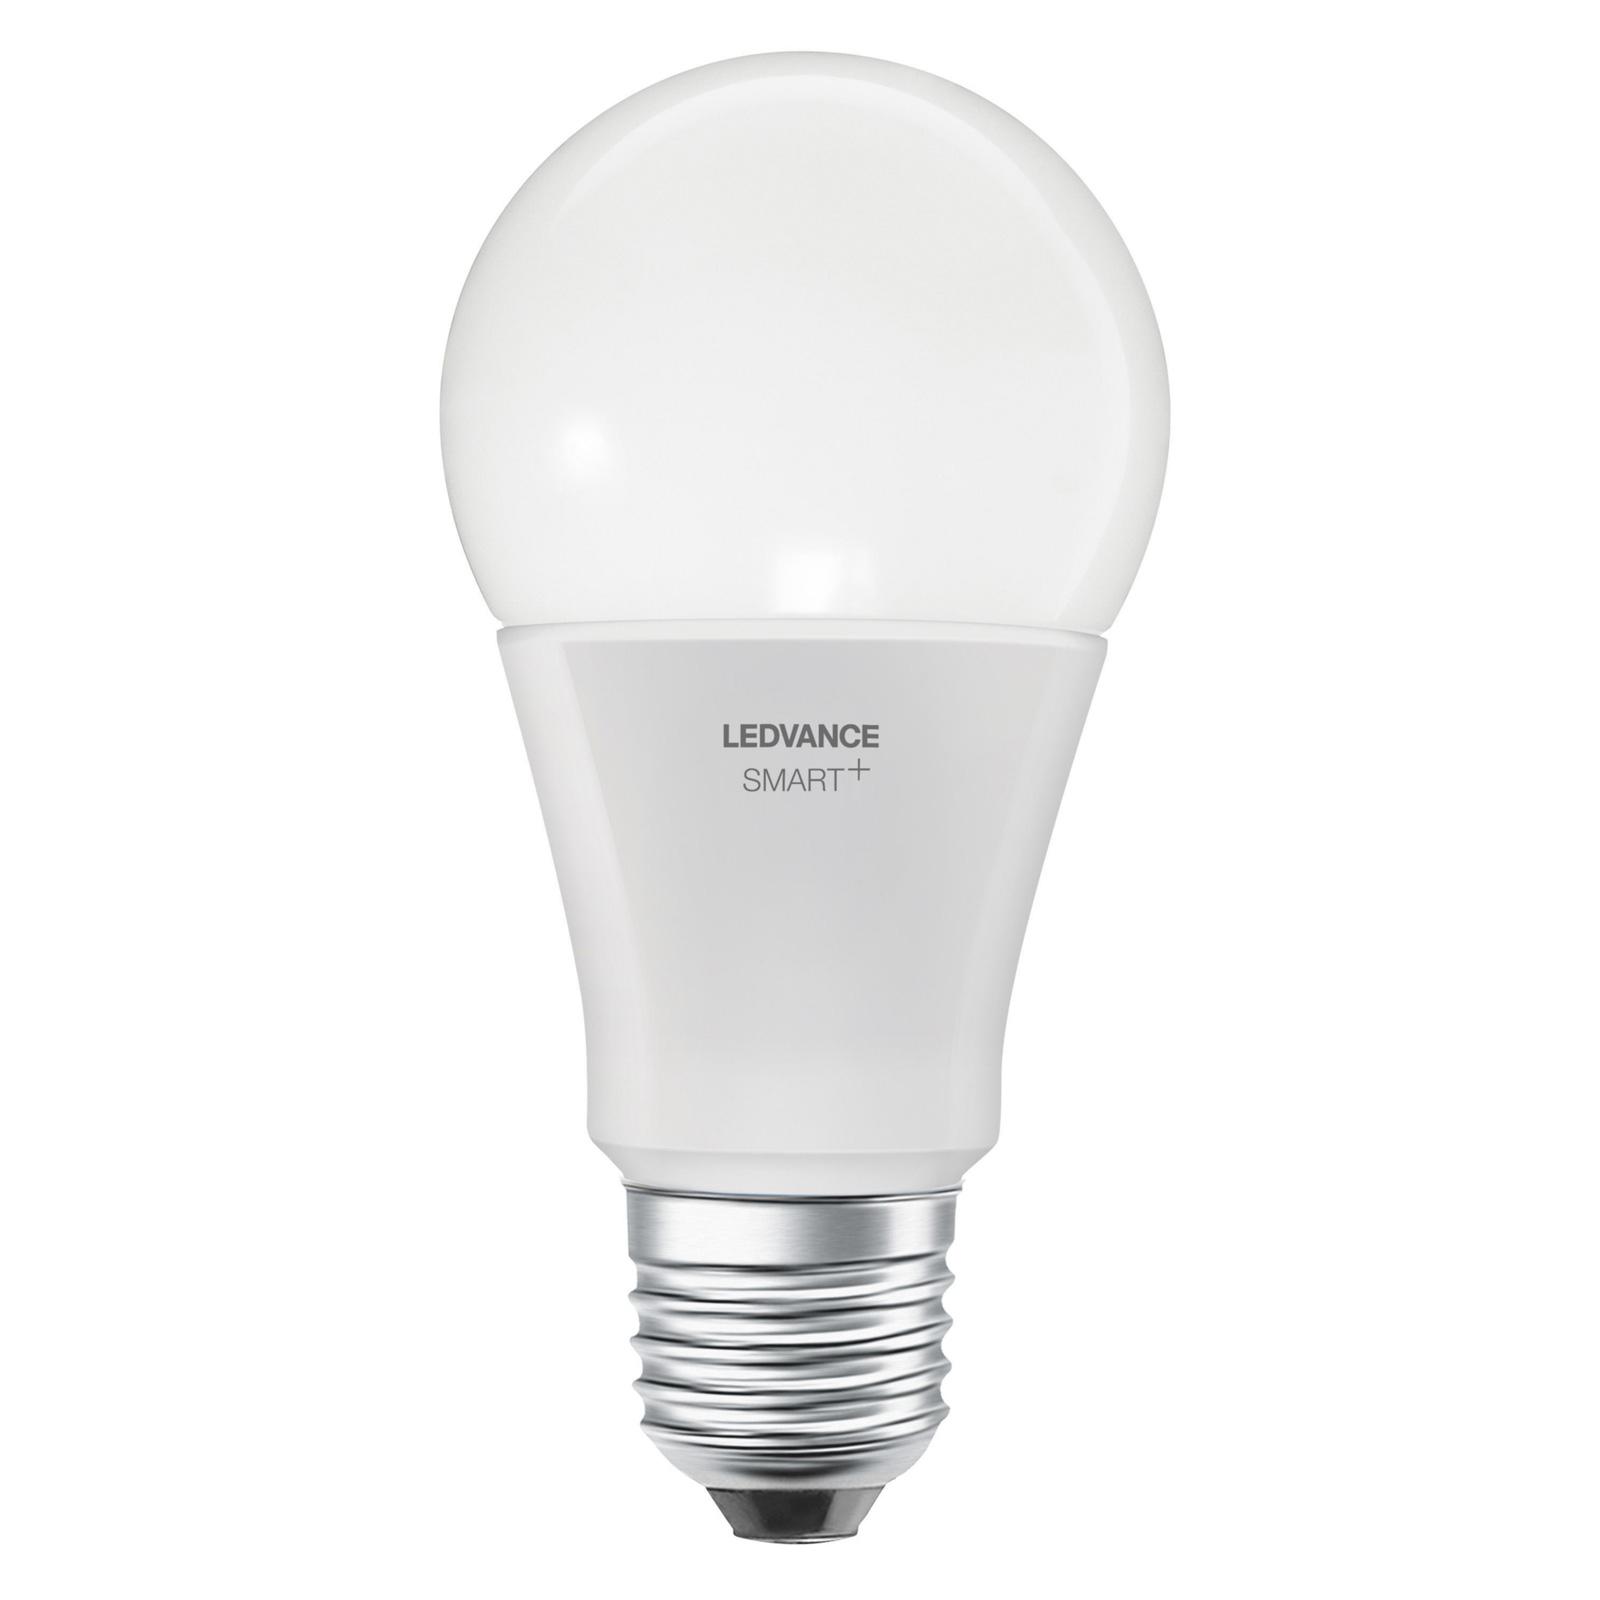 LEDVANCE SMART+ Bluetooth E27 Classic 9W 2 700 K